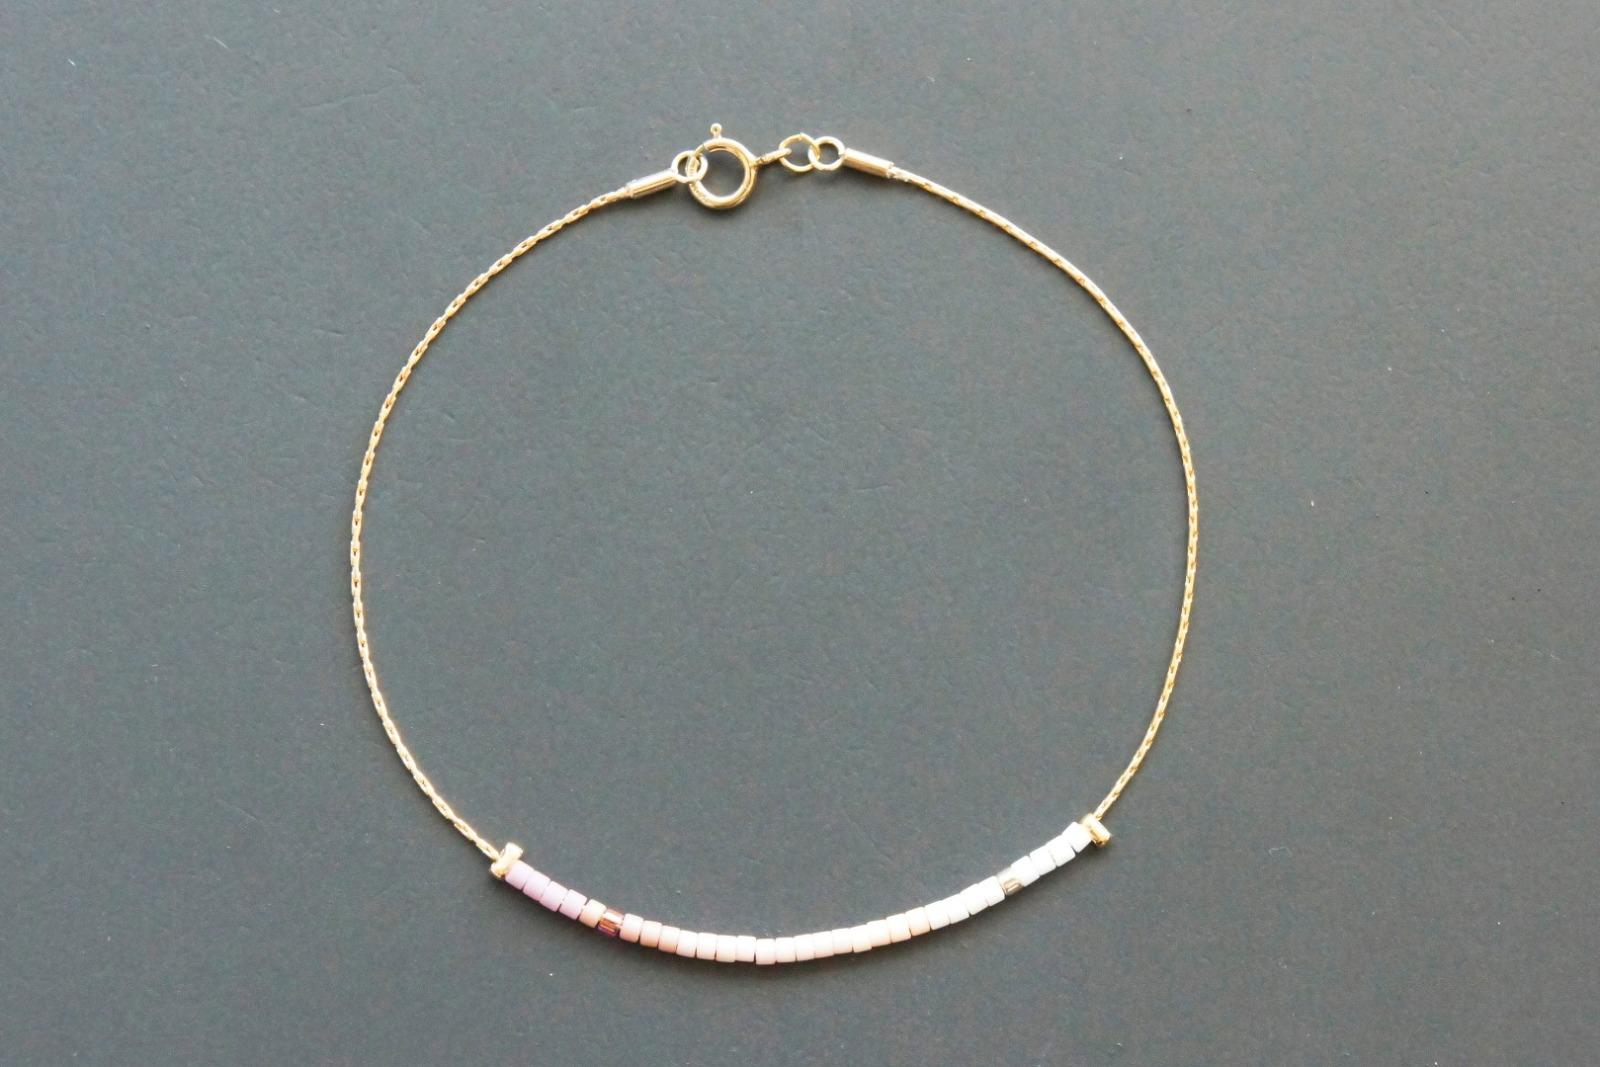 Filigranes Armband gold mit Verlauf rosé